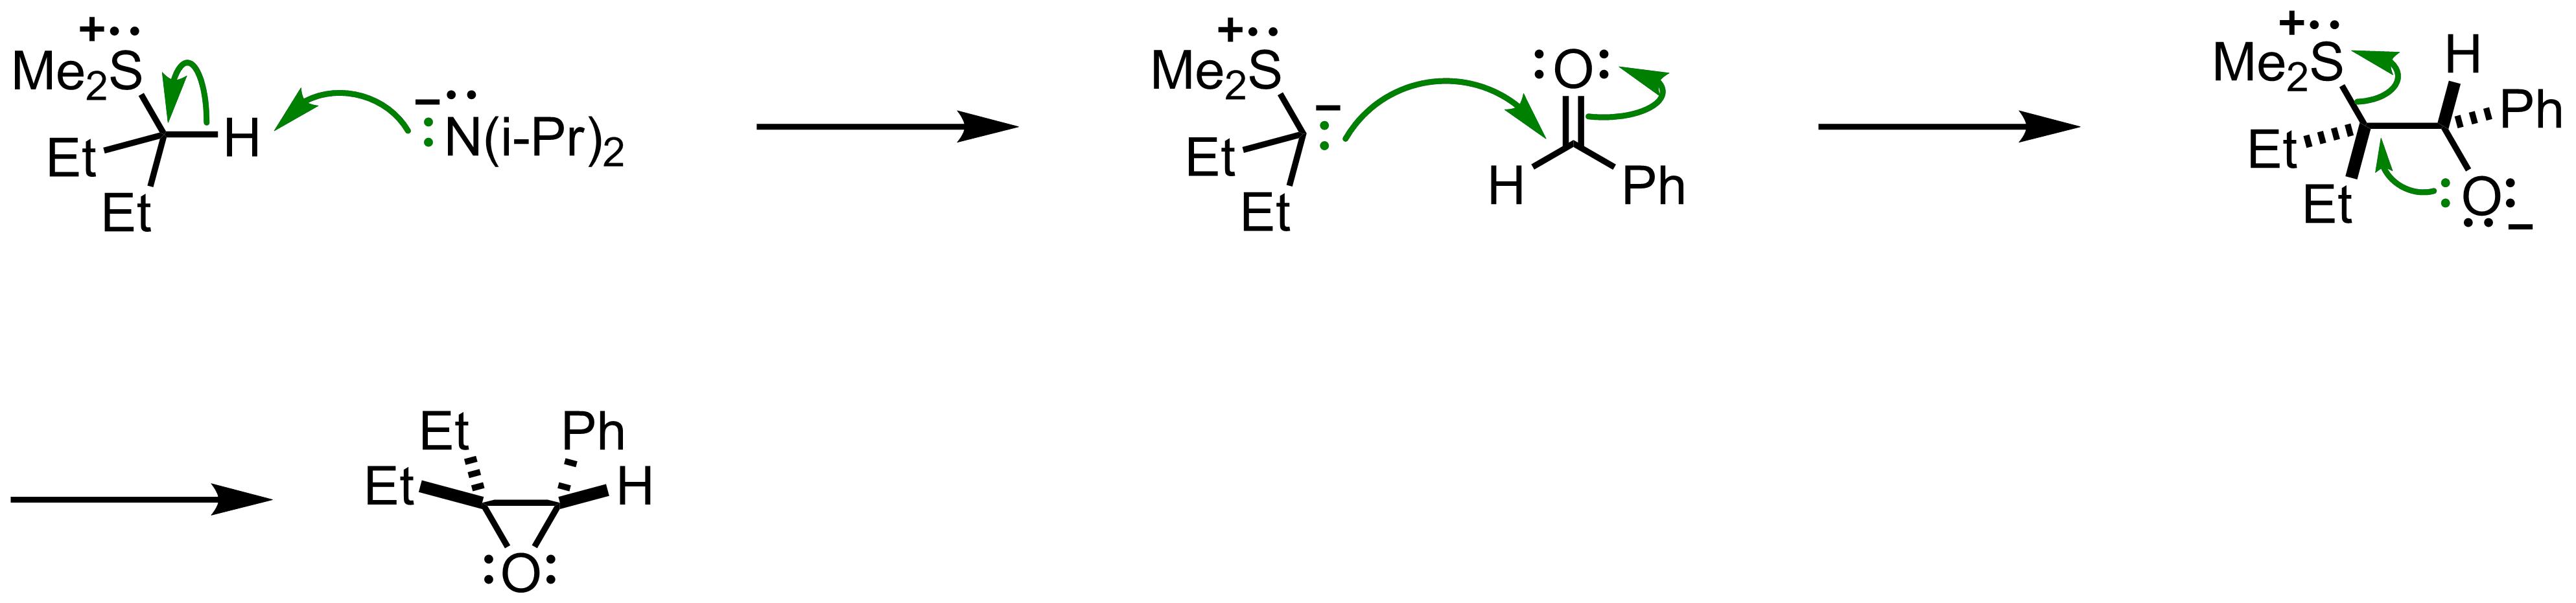 Mechanism of the Johnson-Corey-Chaykovsky Reaction